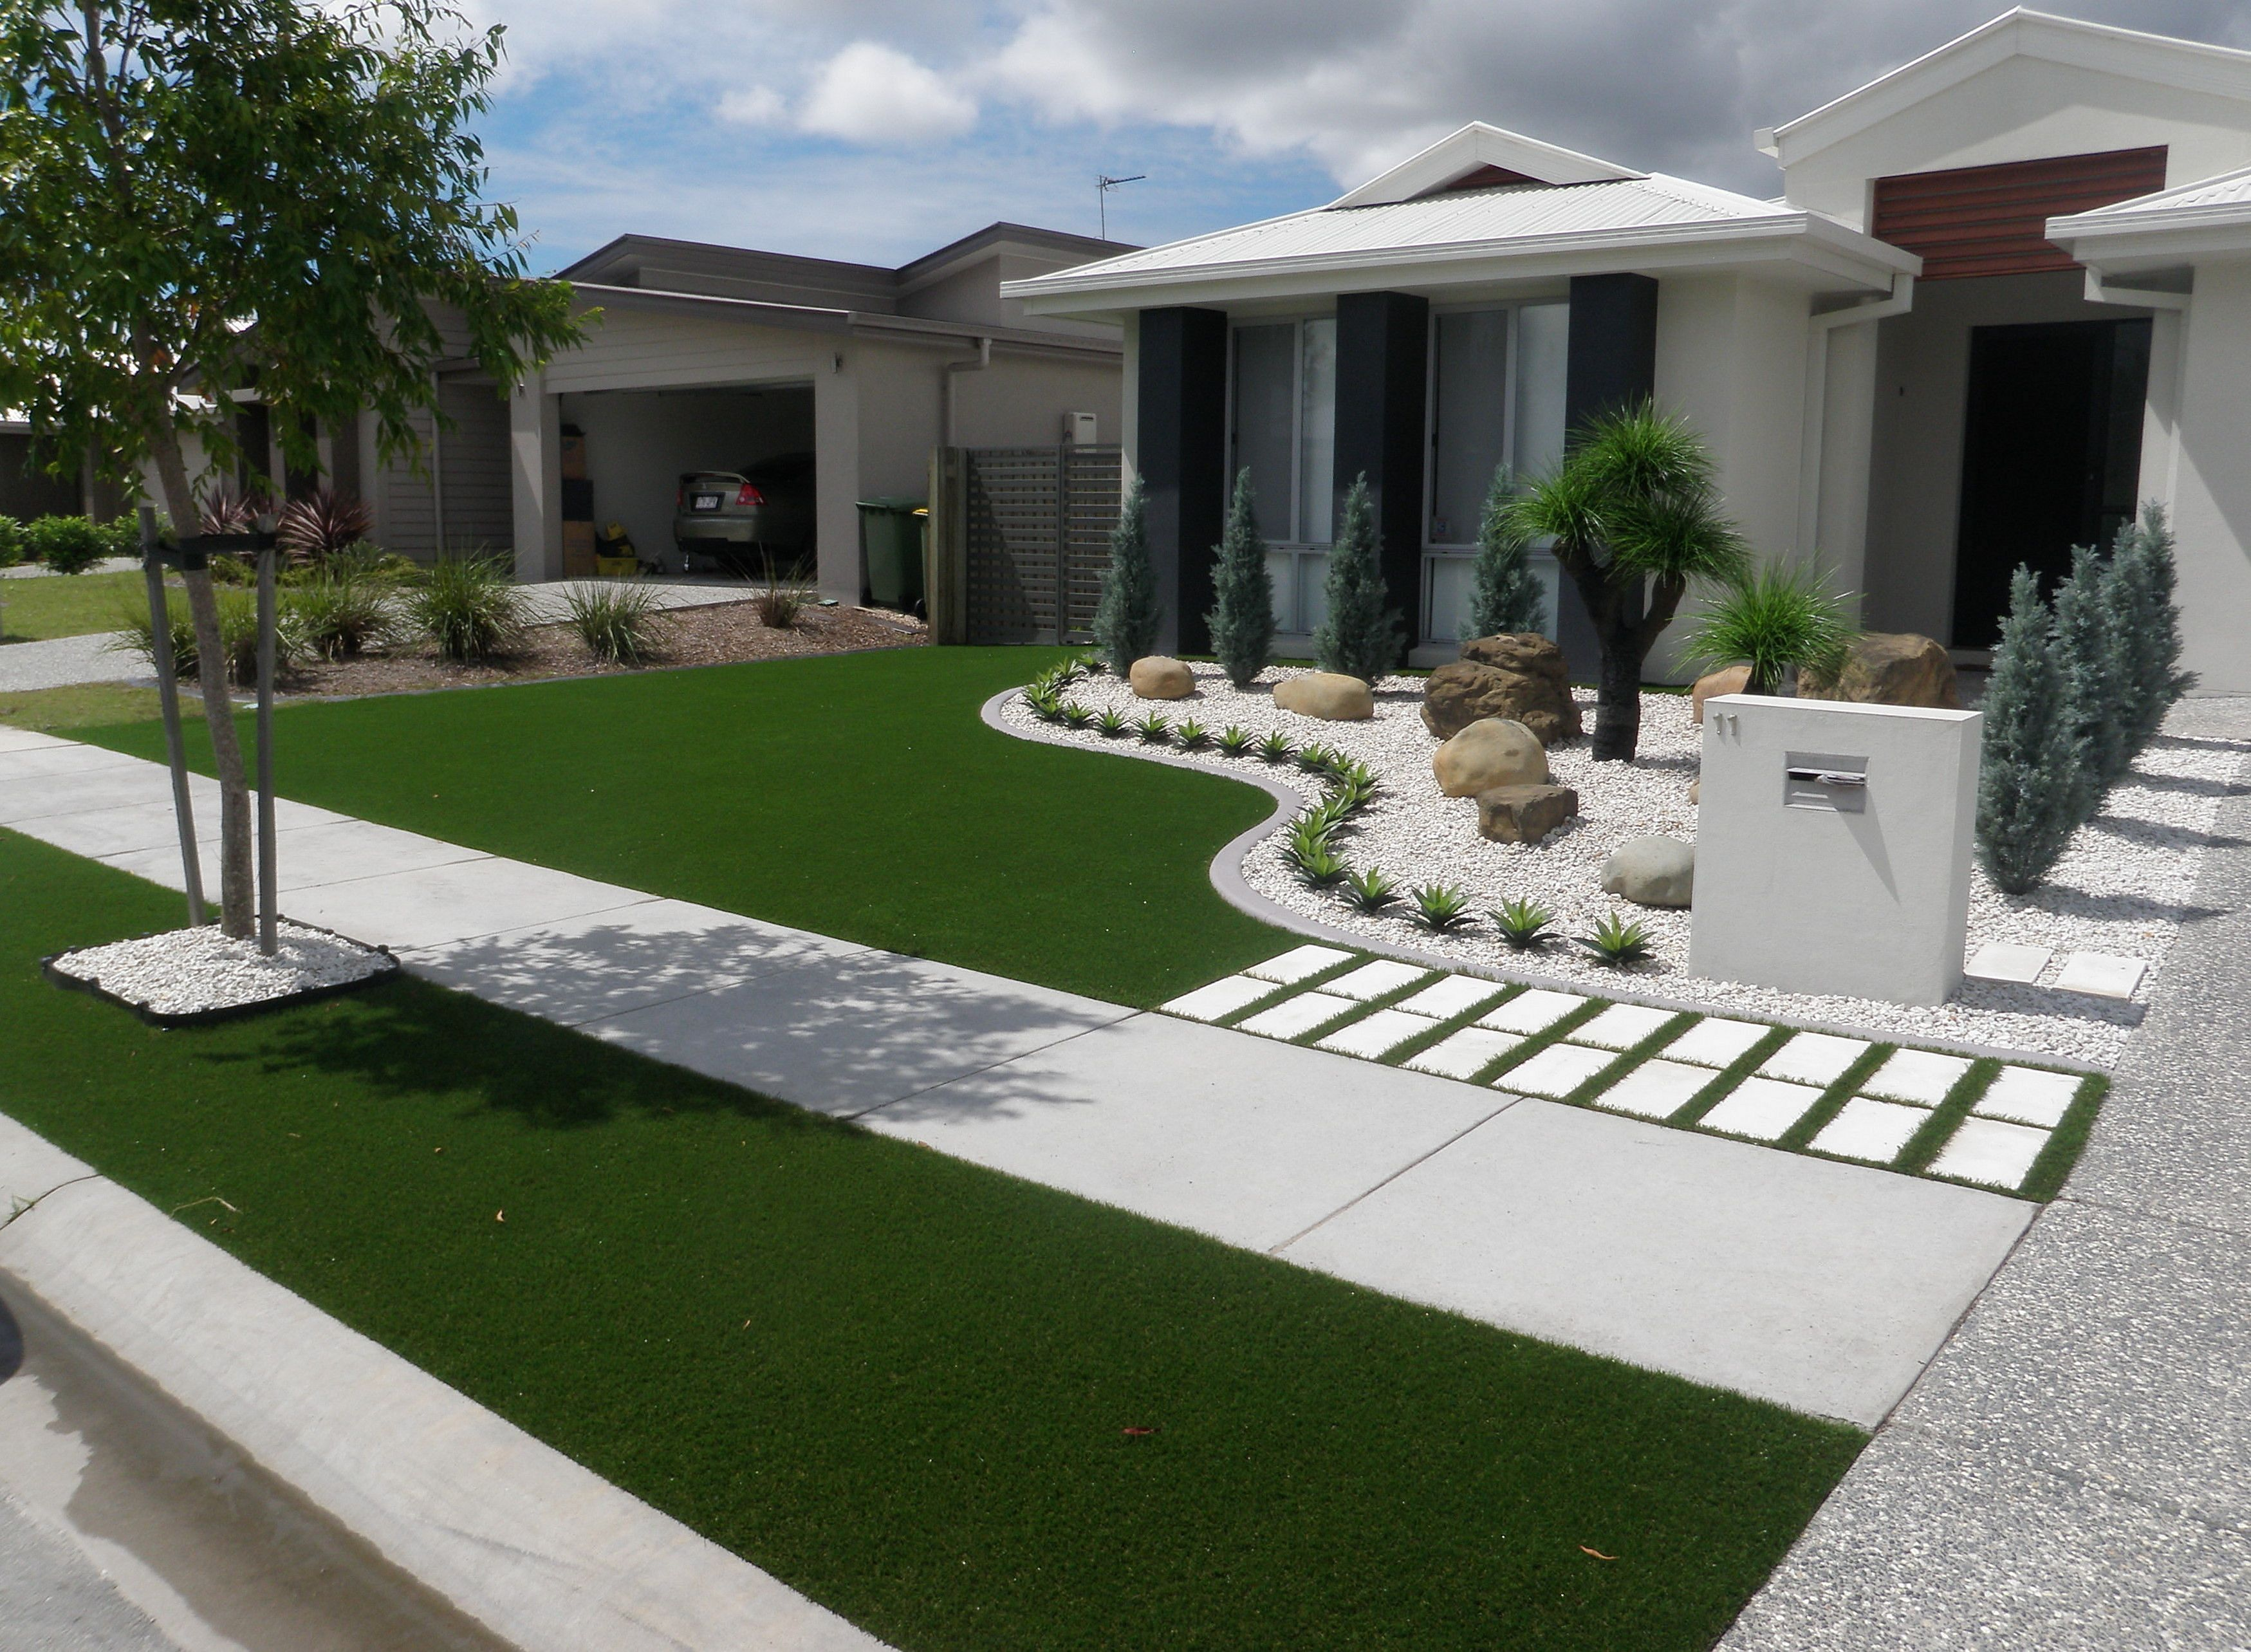 12 Best And Wonderful Modern Front Yard Landscaping Design Ideas